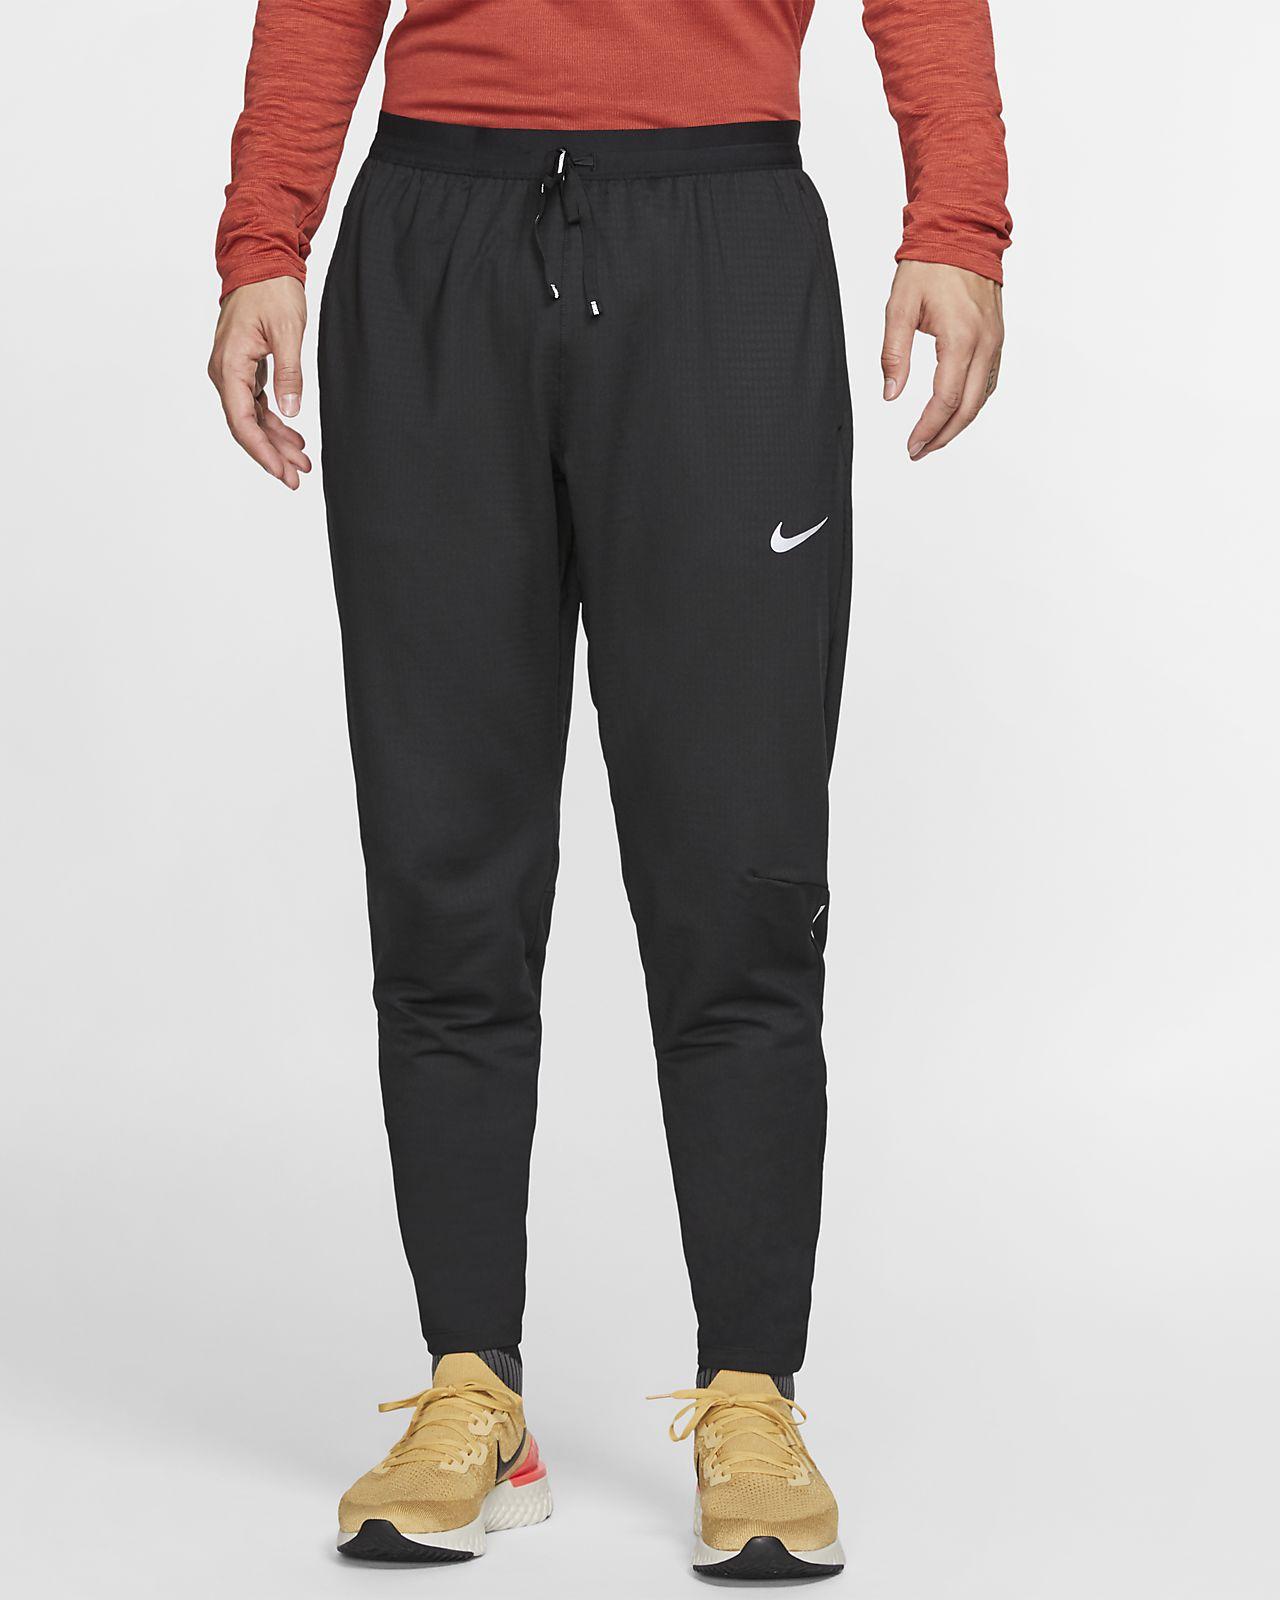 Nike Phenom 男子针织跑步长裤